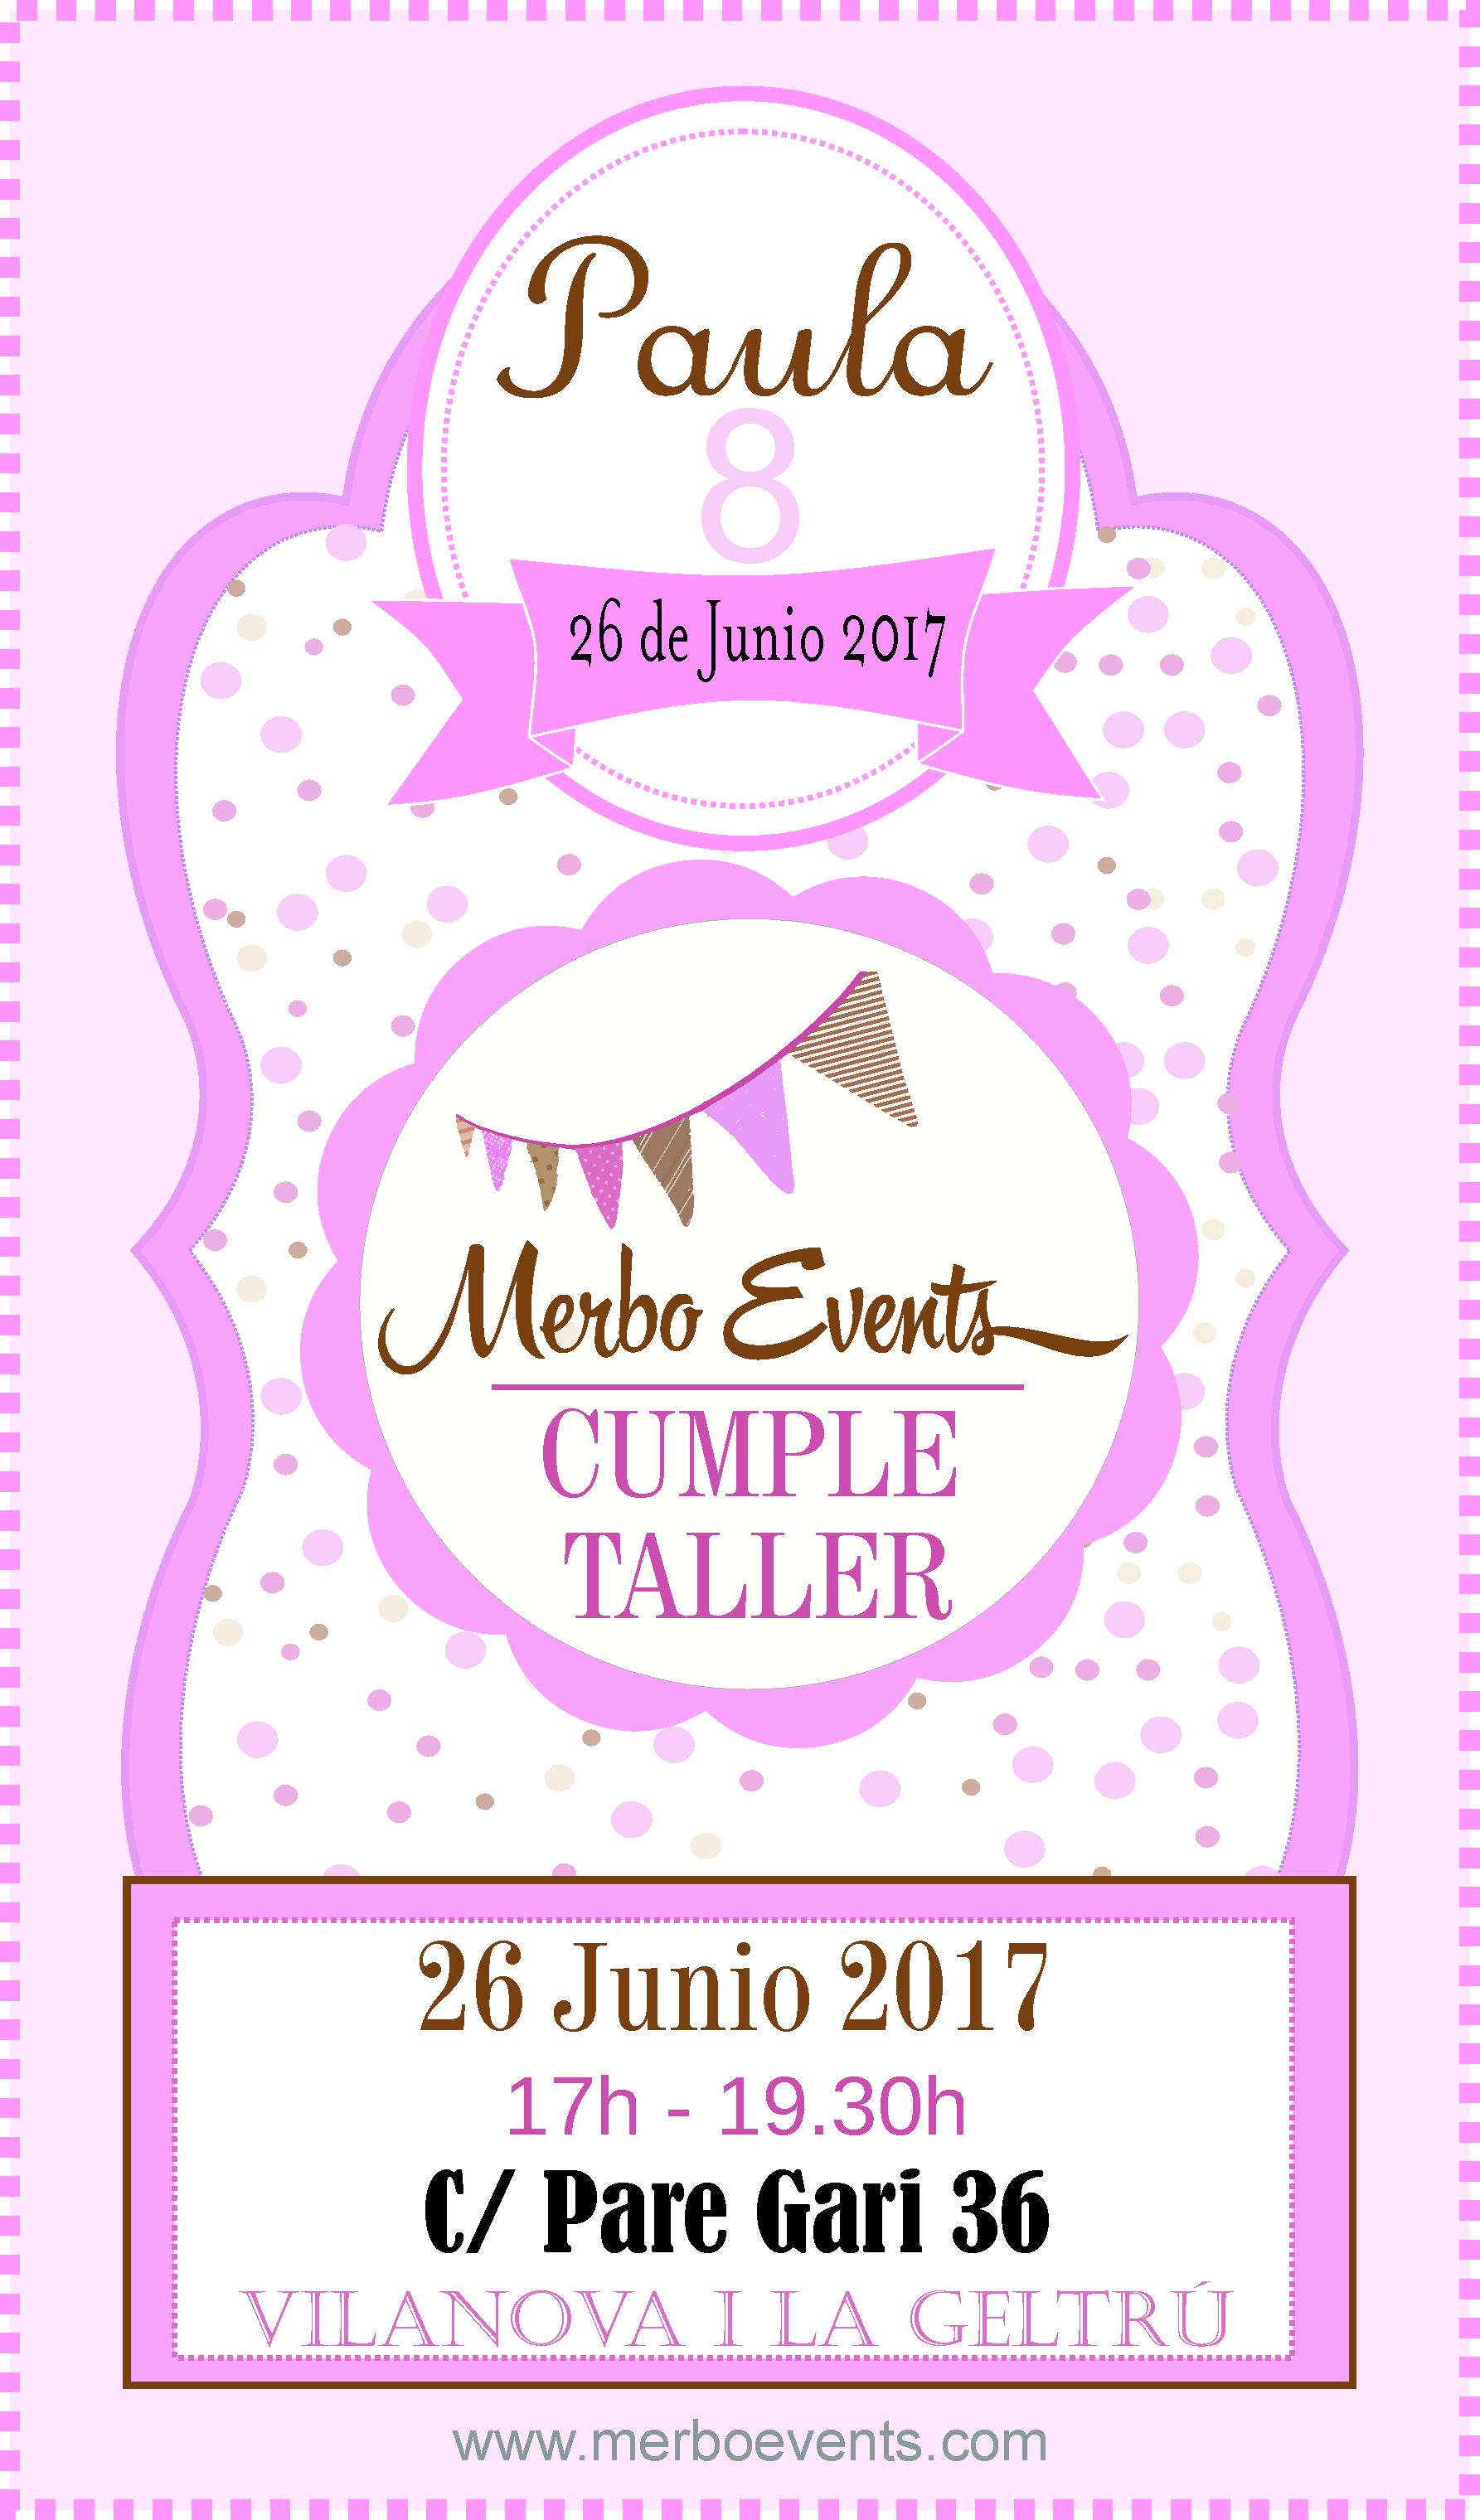 cumple taller Merbo Events